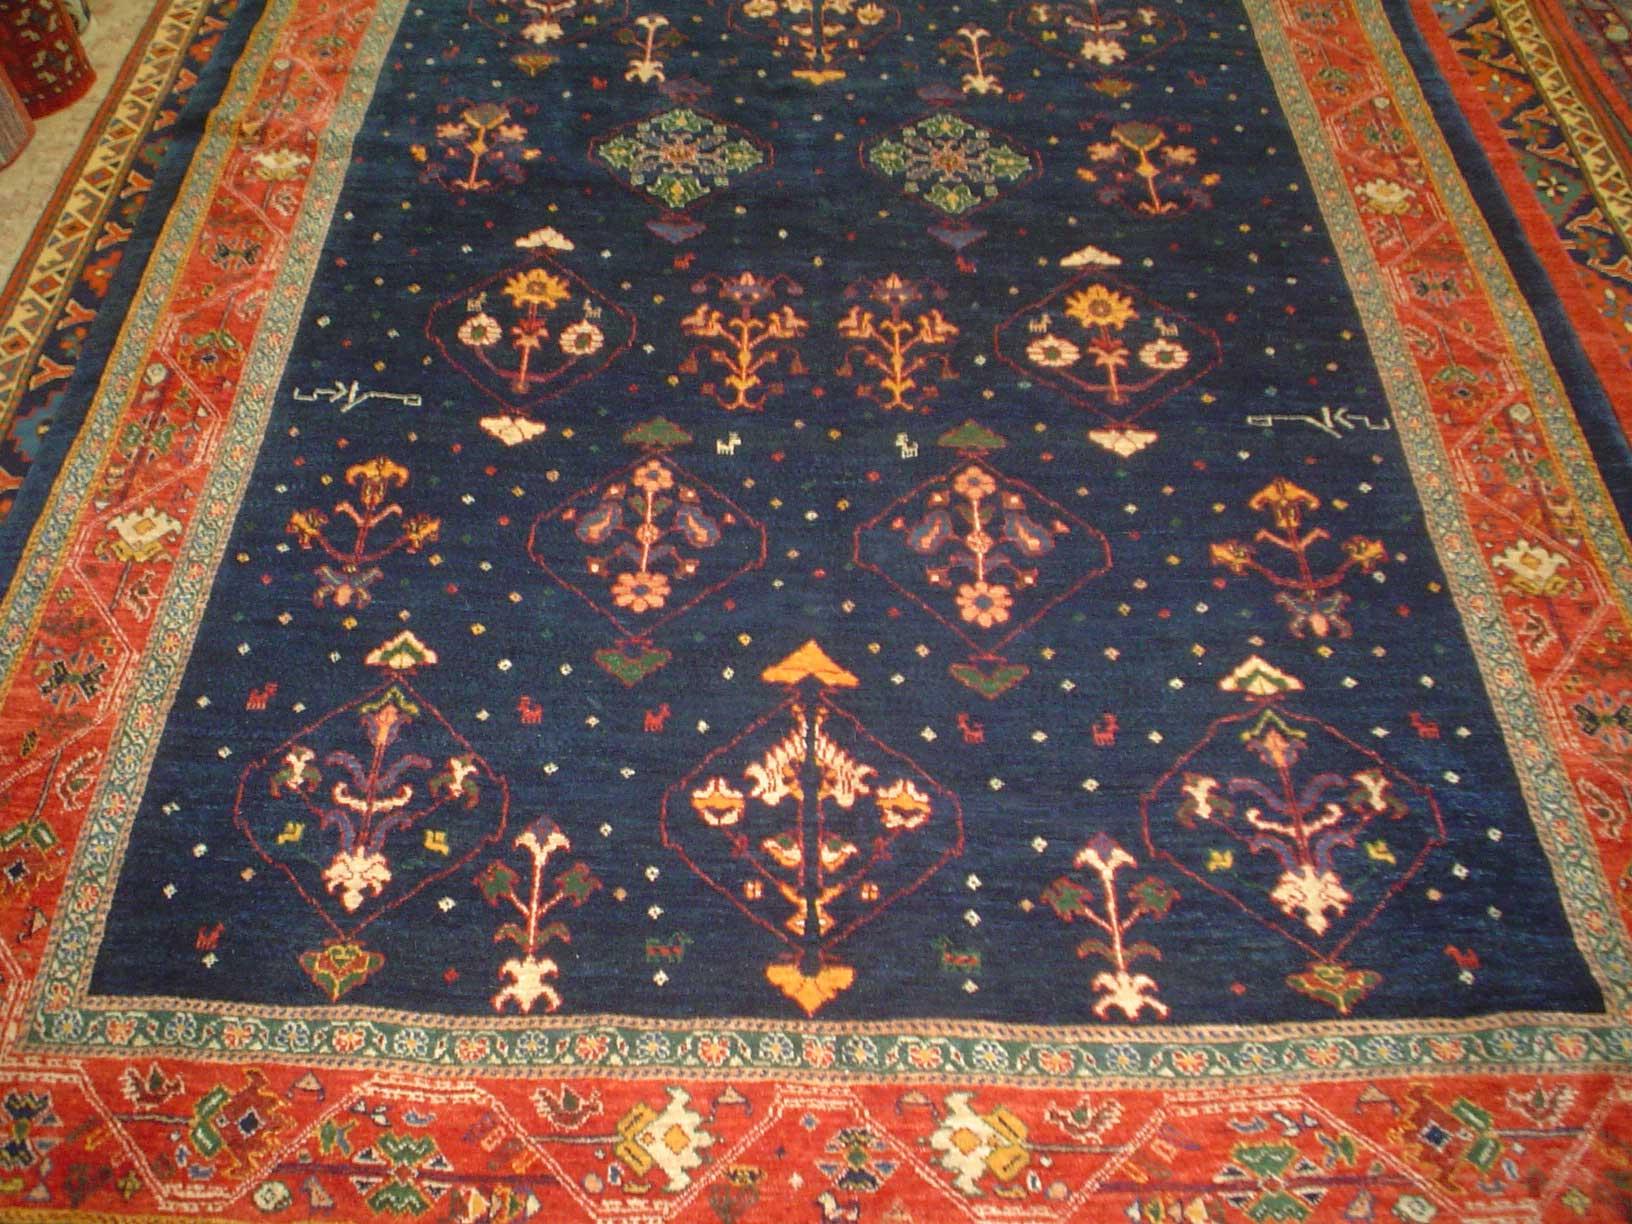 Truly wonderful 6 x 8 Persian tribal rug. Khamsehbaf. Navy with detailed tribal designs and a dark red border.